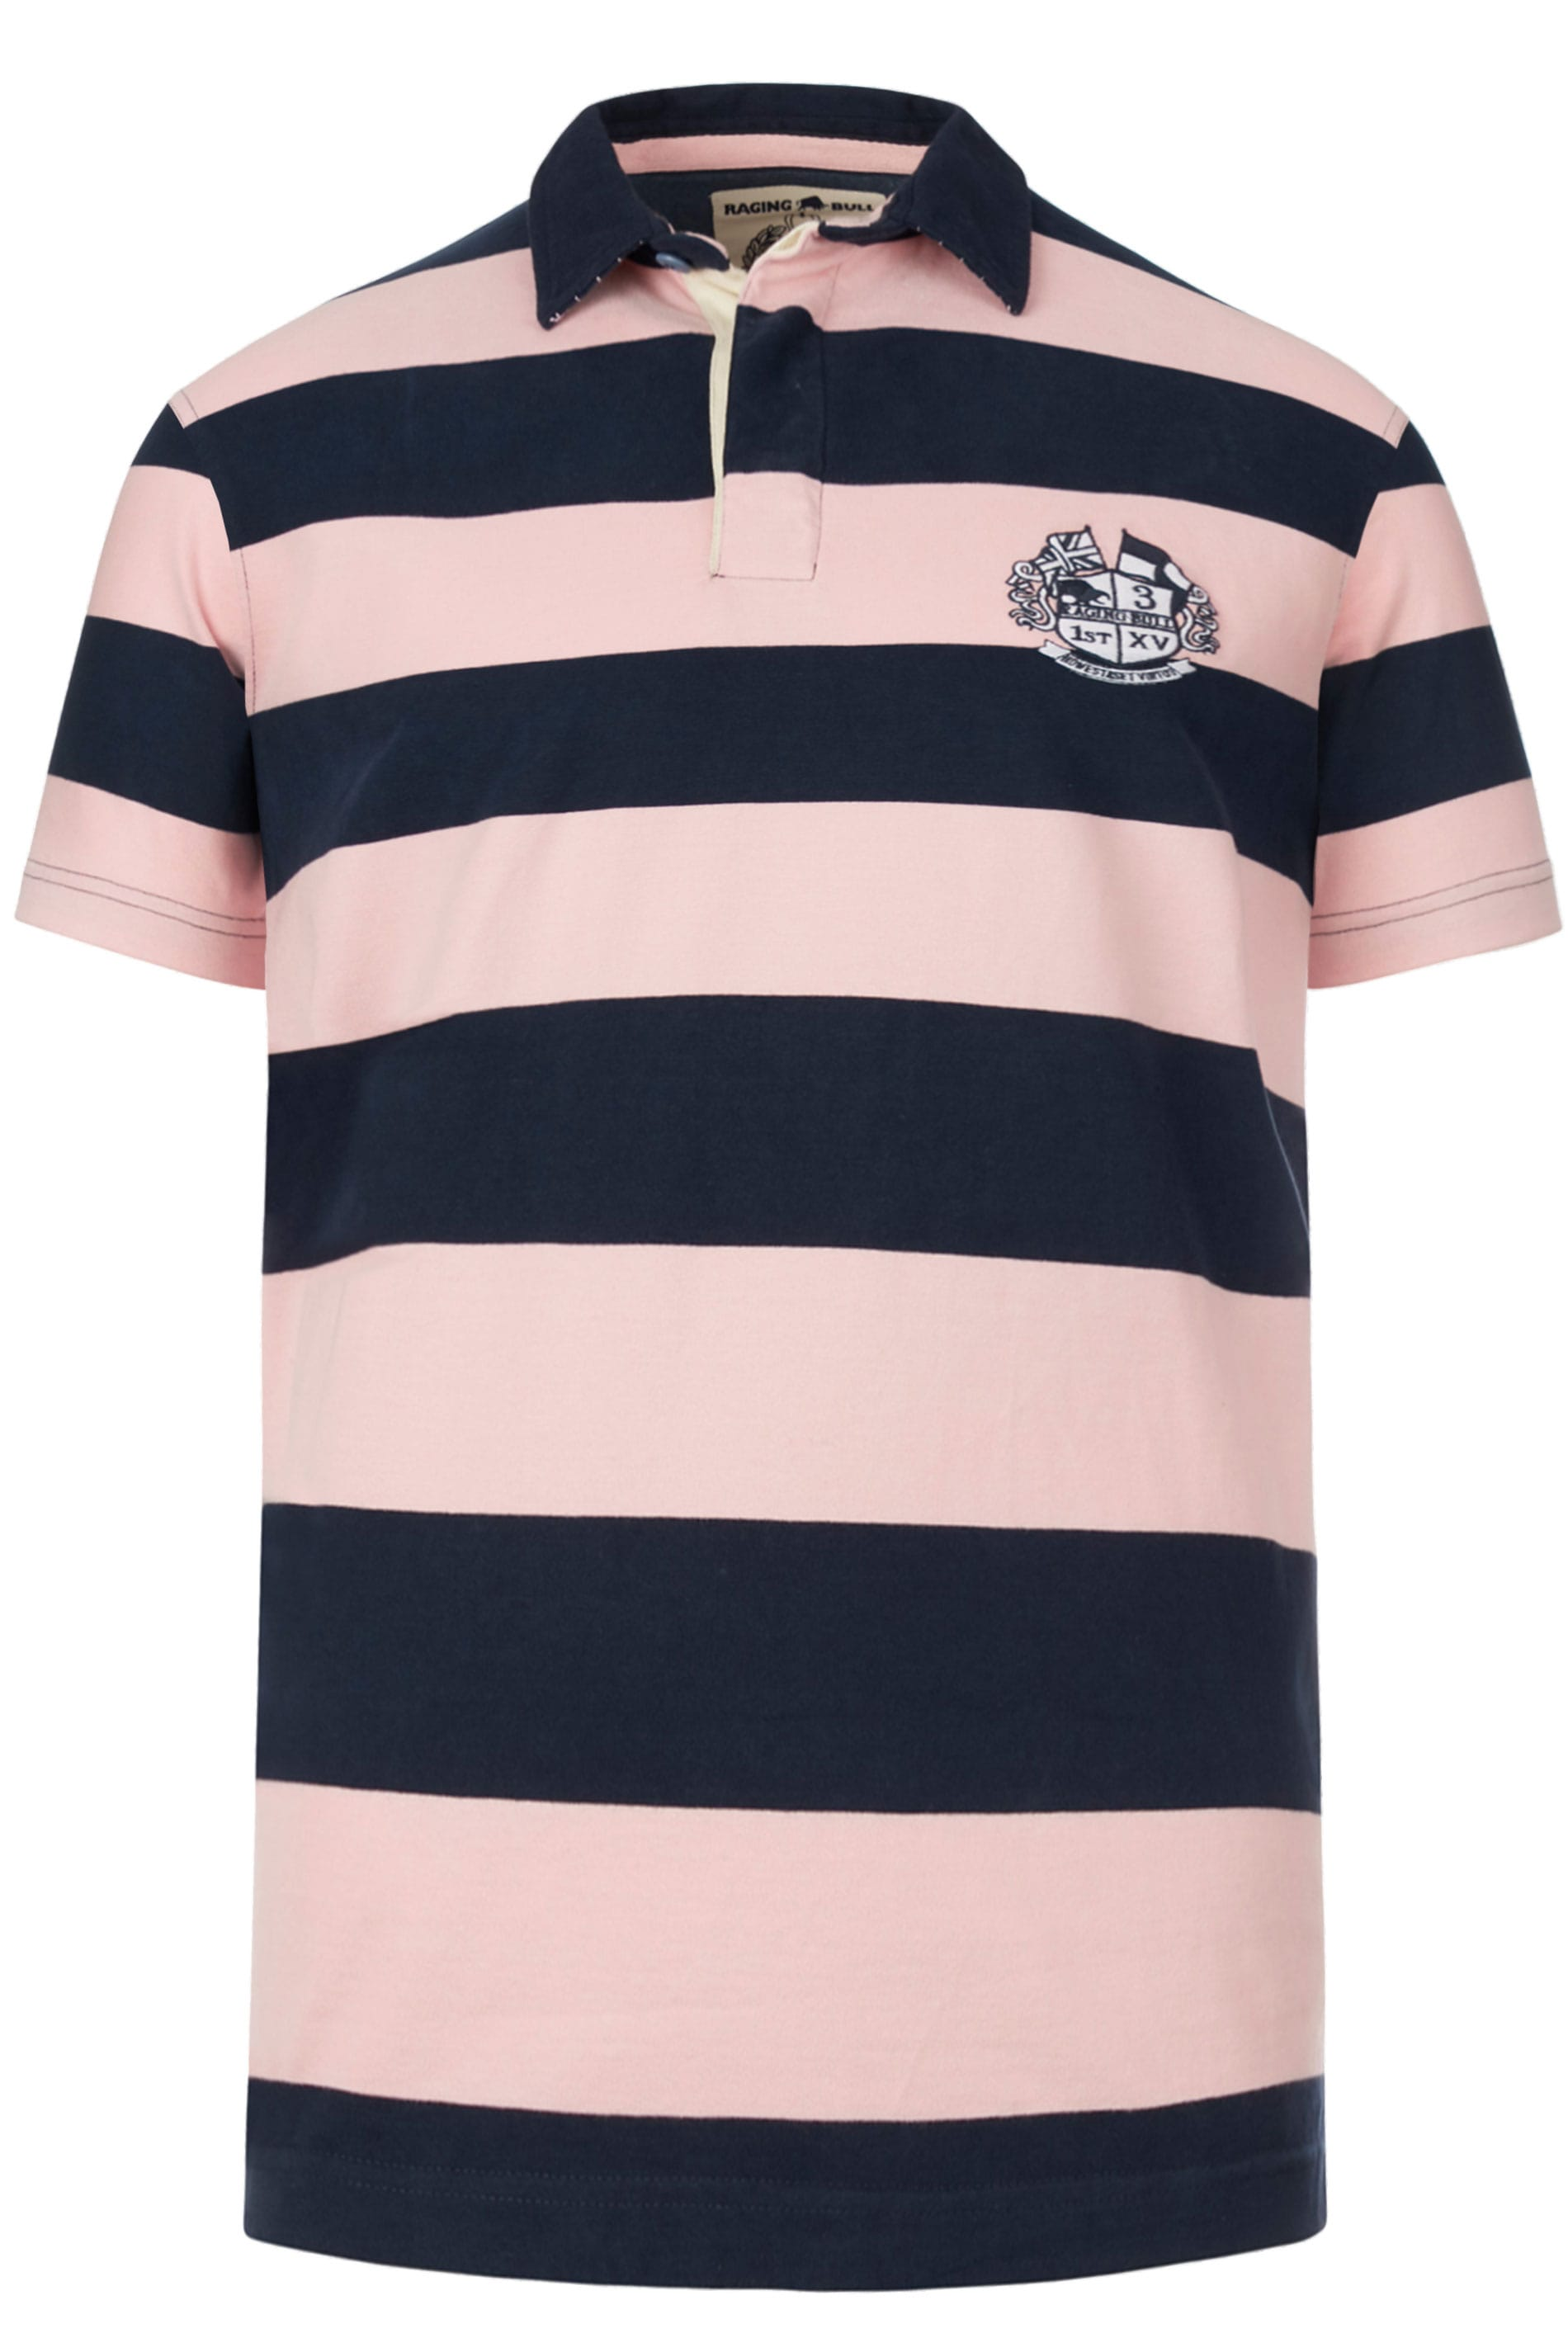 RAGING BULL - Poloshirt van katoen met strepen in roze